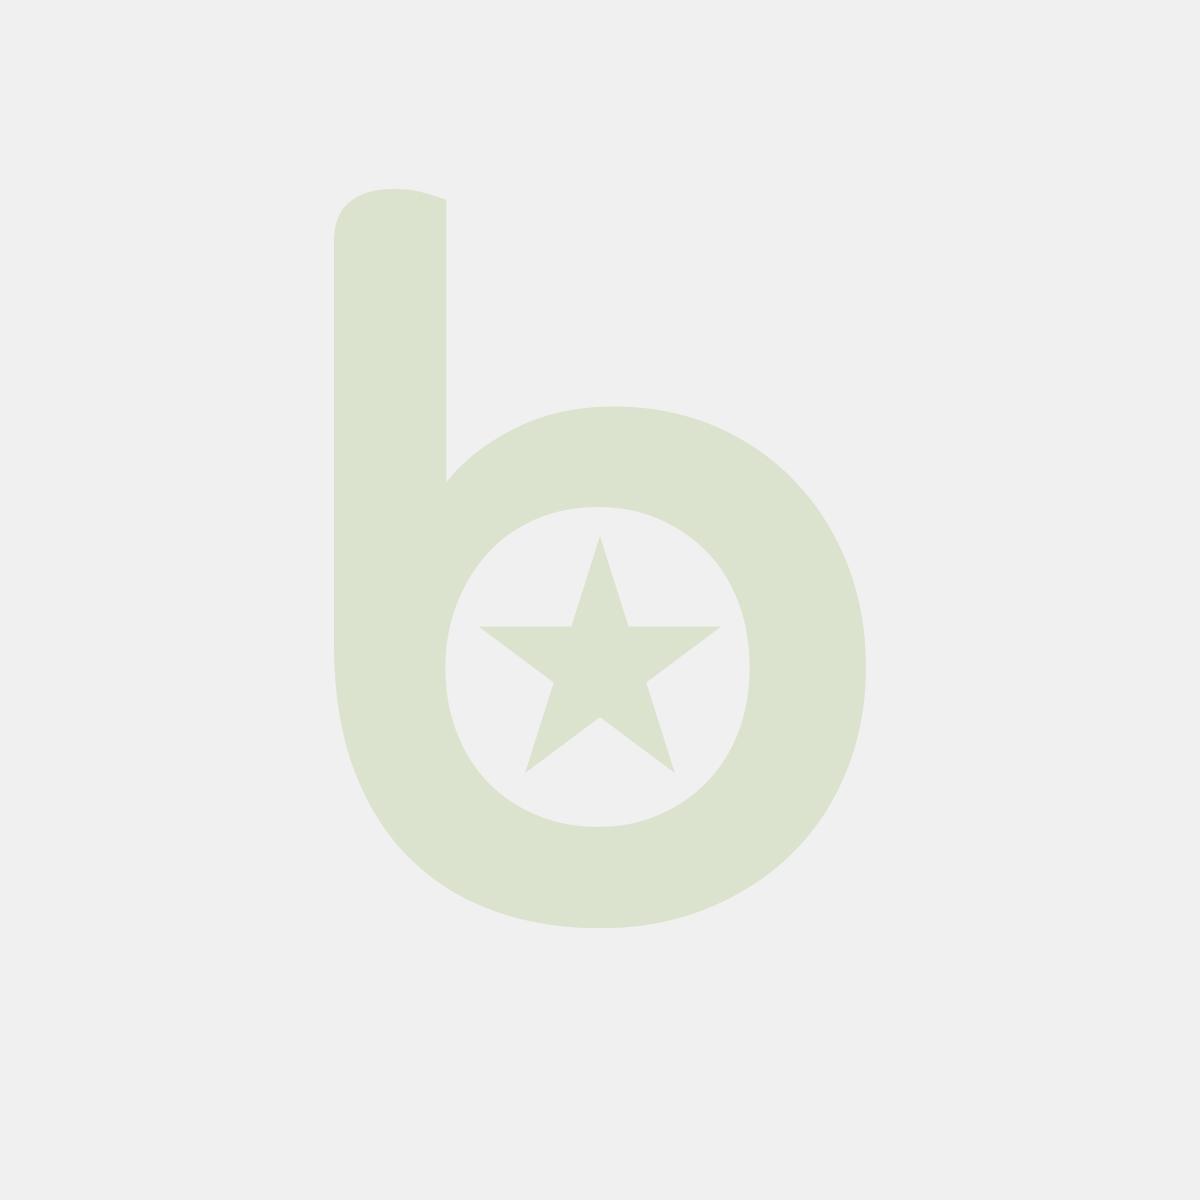 Szpagat jutowy Q-CONNECT, 30g, 15m, brązowy